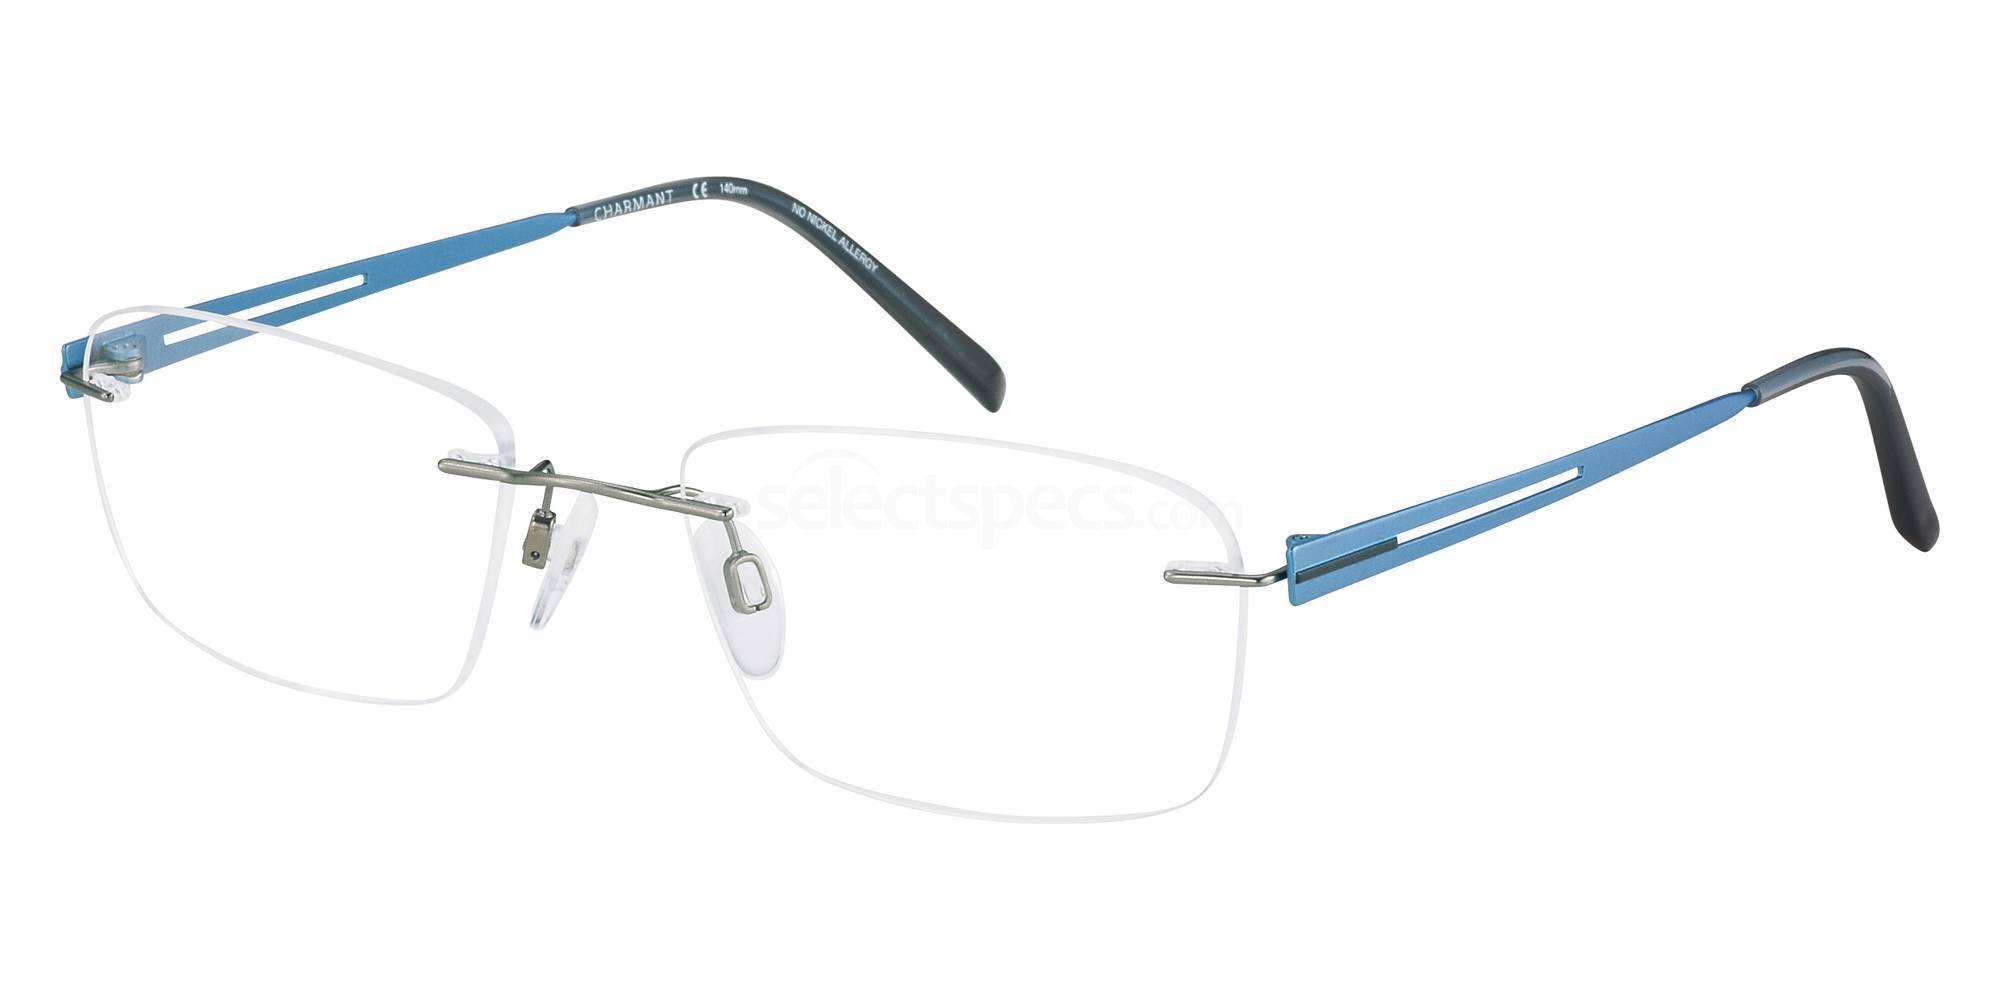 GR CH10966 Glasses, Charmant Titanium Perfection